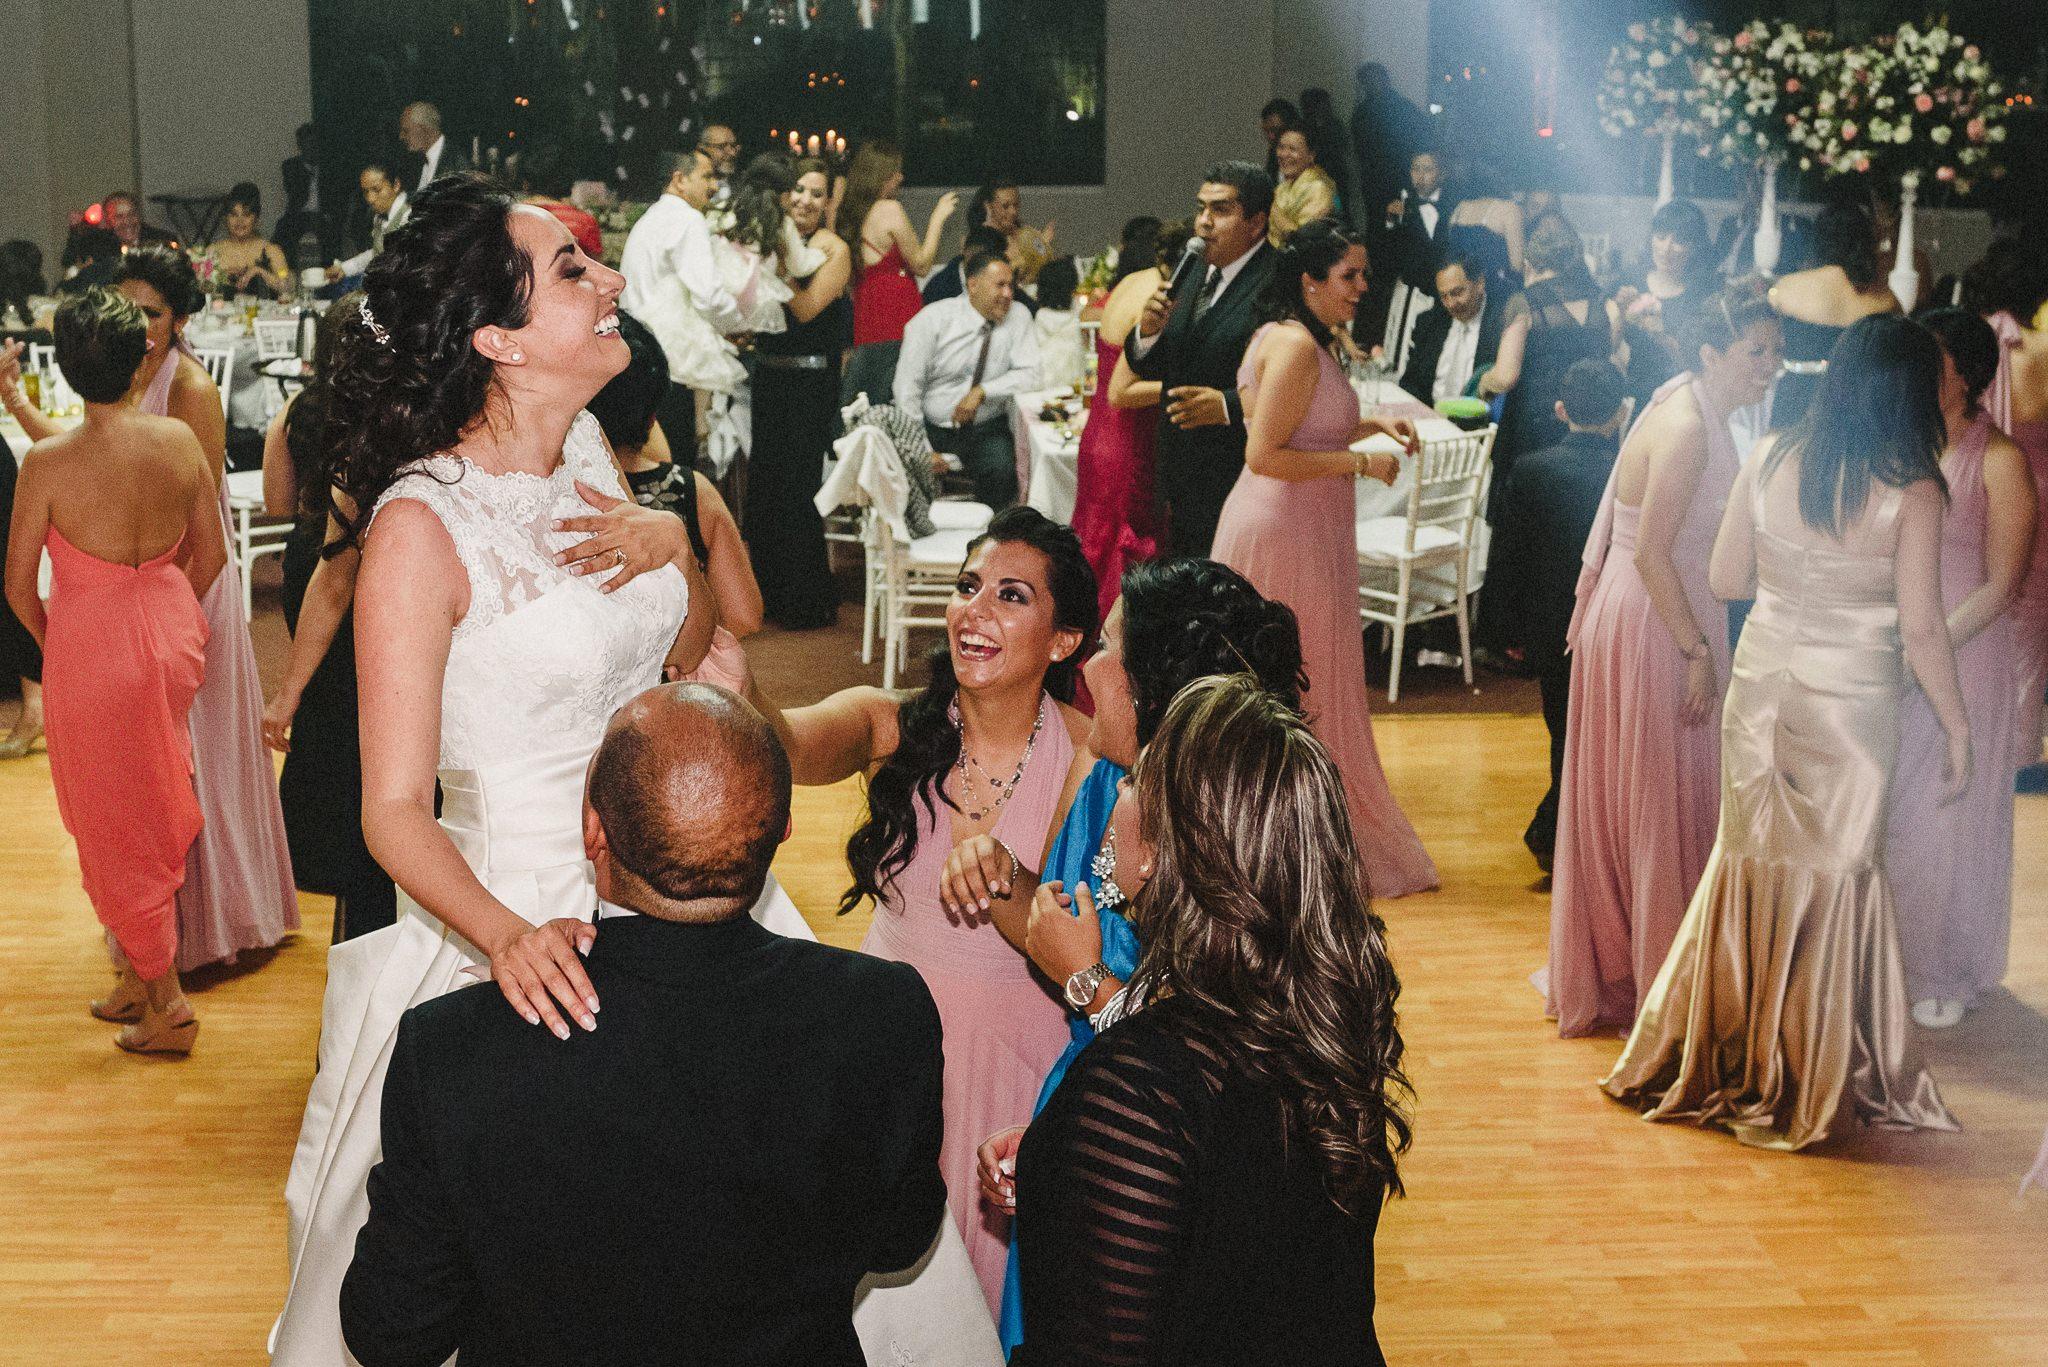 Wedding-Boda-Tulancingo-Hidalgo-Salon-Essenzia-Luis-Houdin-68-film